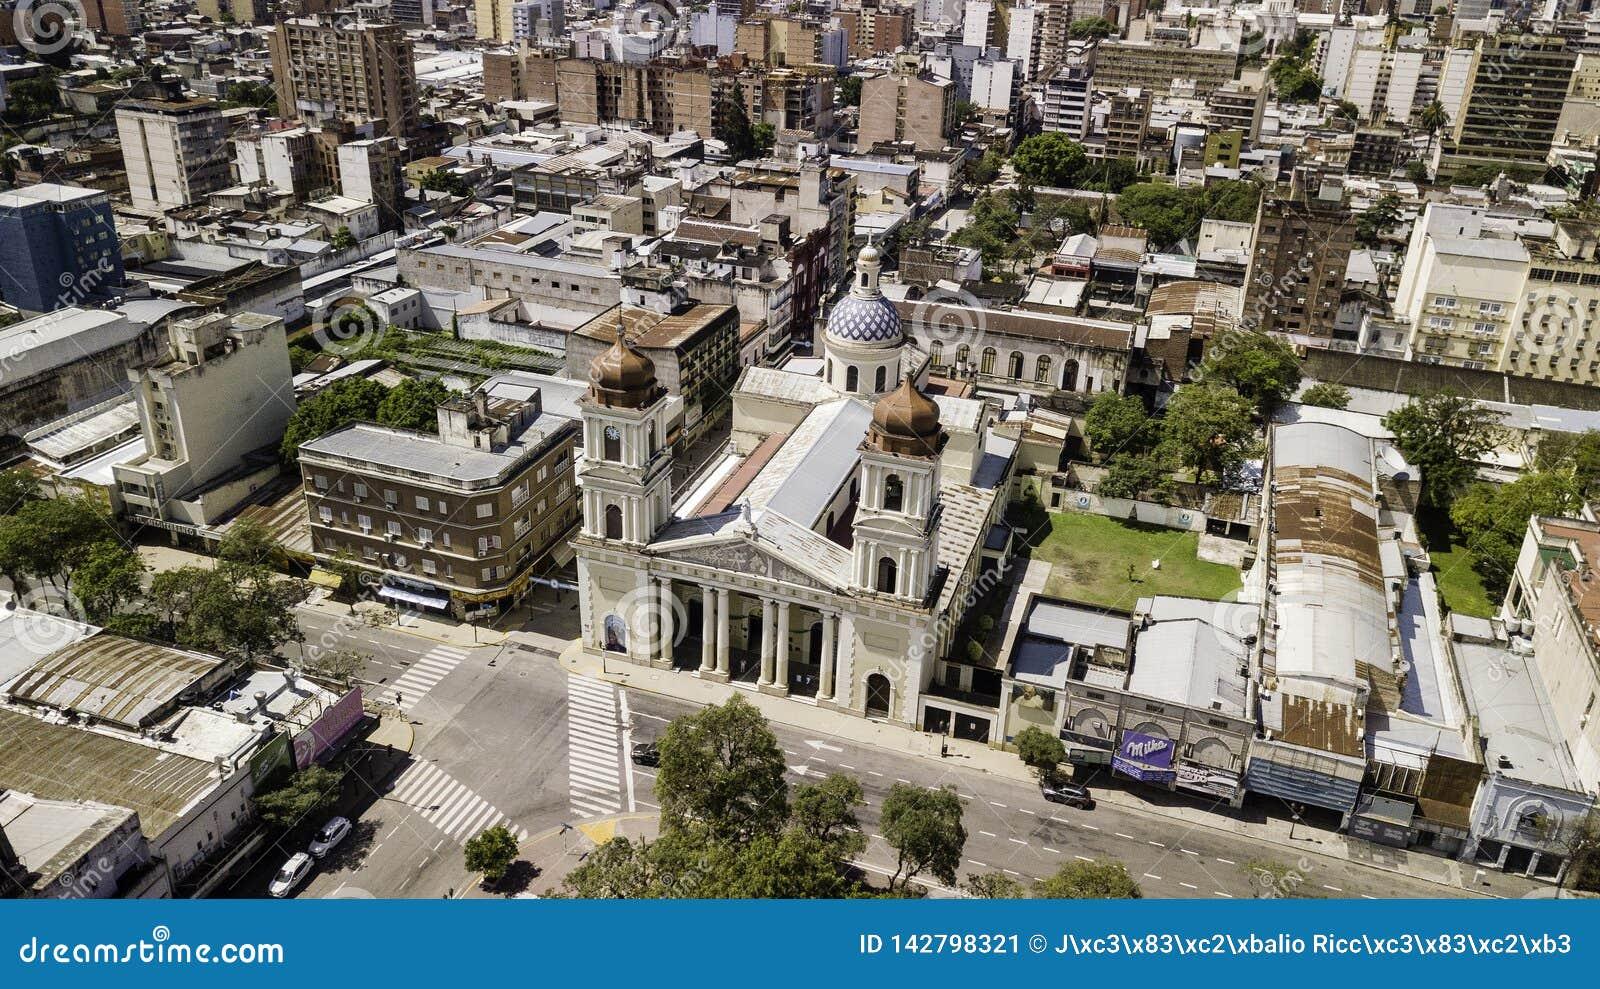 ¡ N/Argentina do ¡ n/Tucumà de San Miguel de Tucumà - 01 01 19: Catedral de nossa senhora da encarnação, ¡ n de San Miguel de Tuc